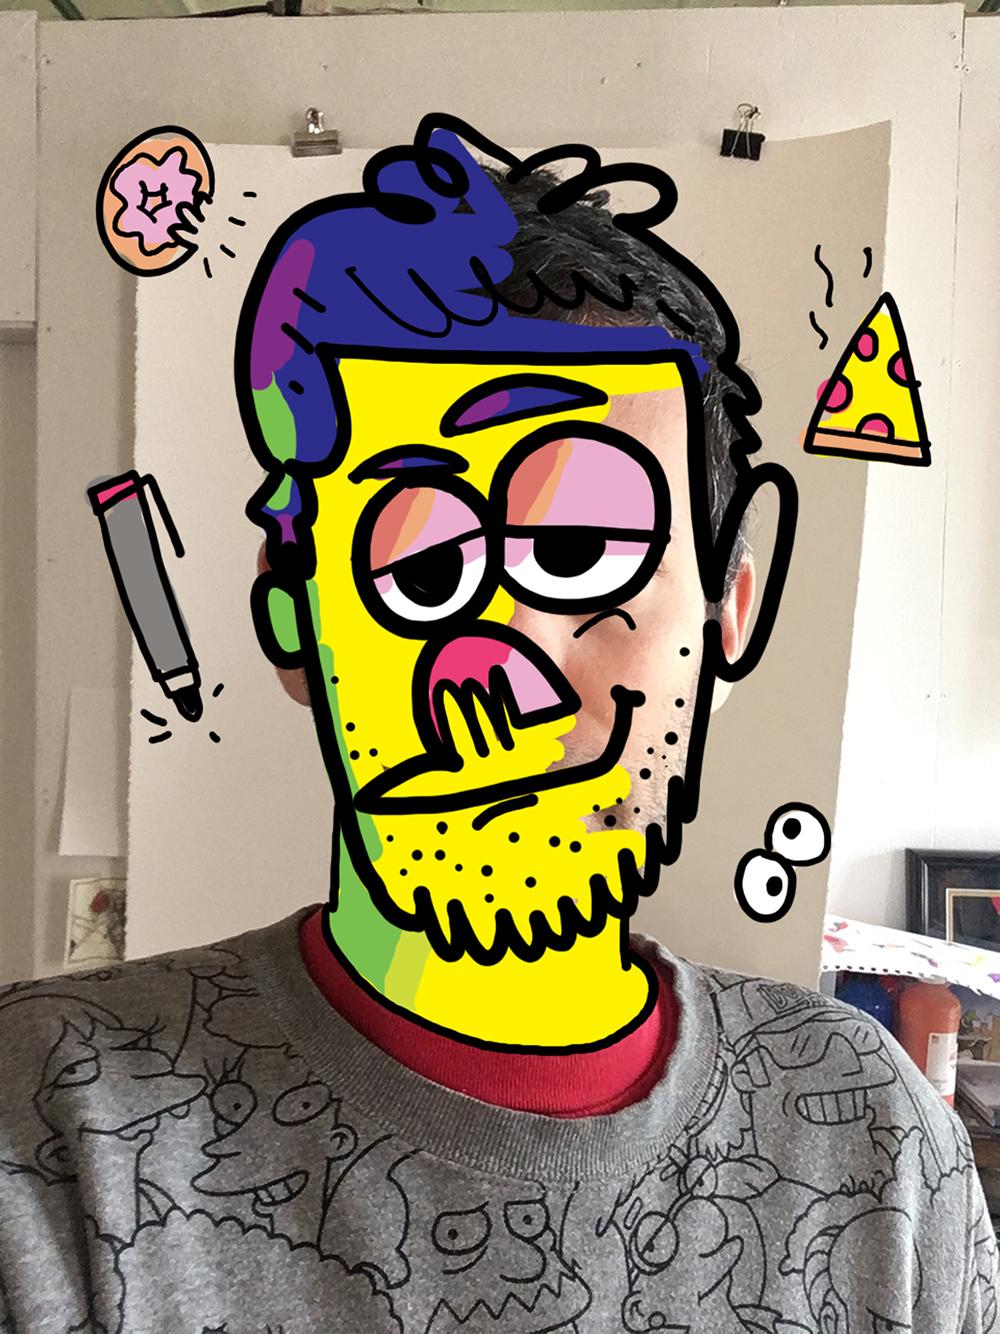 Jon_Burgerman_FaceOff.jpg